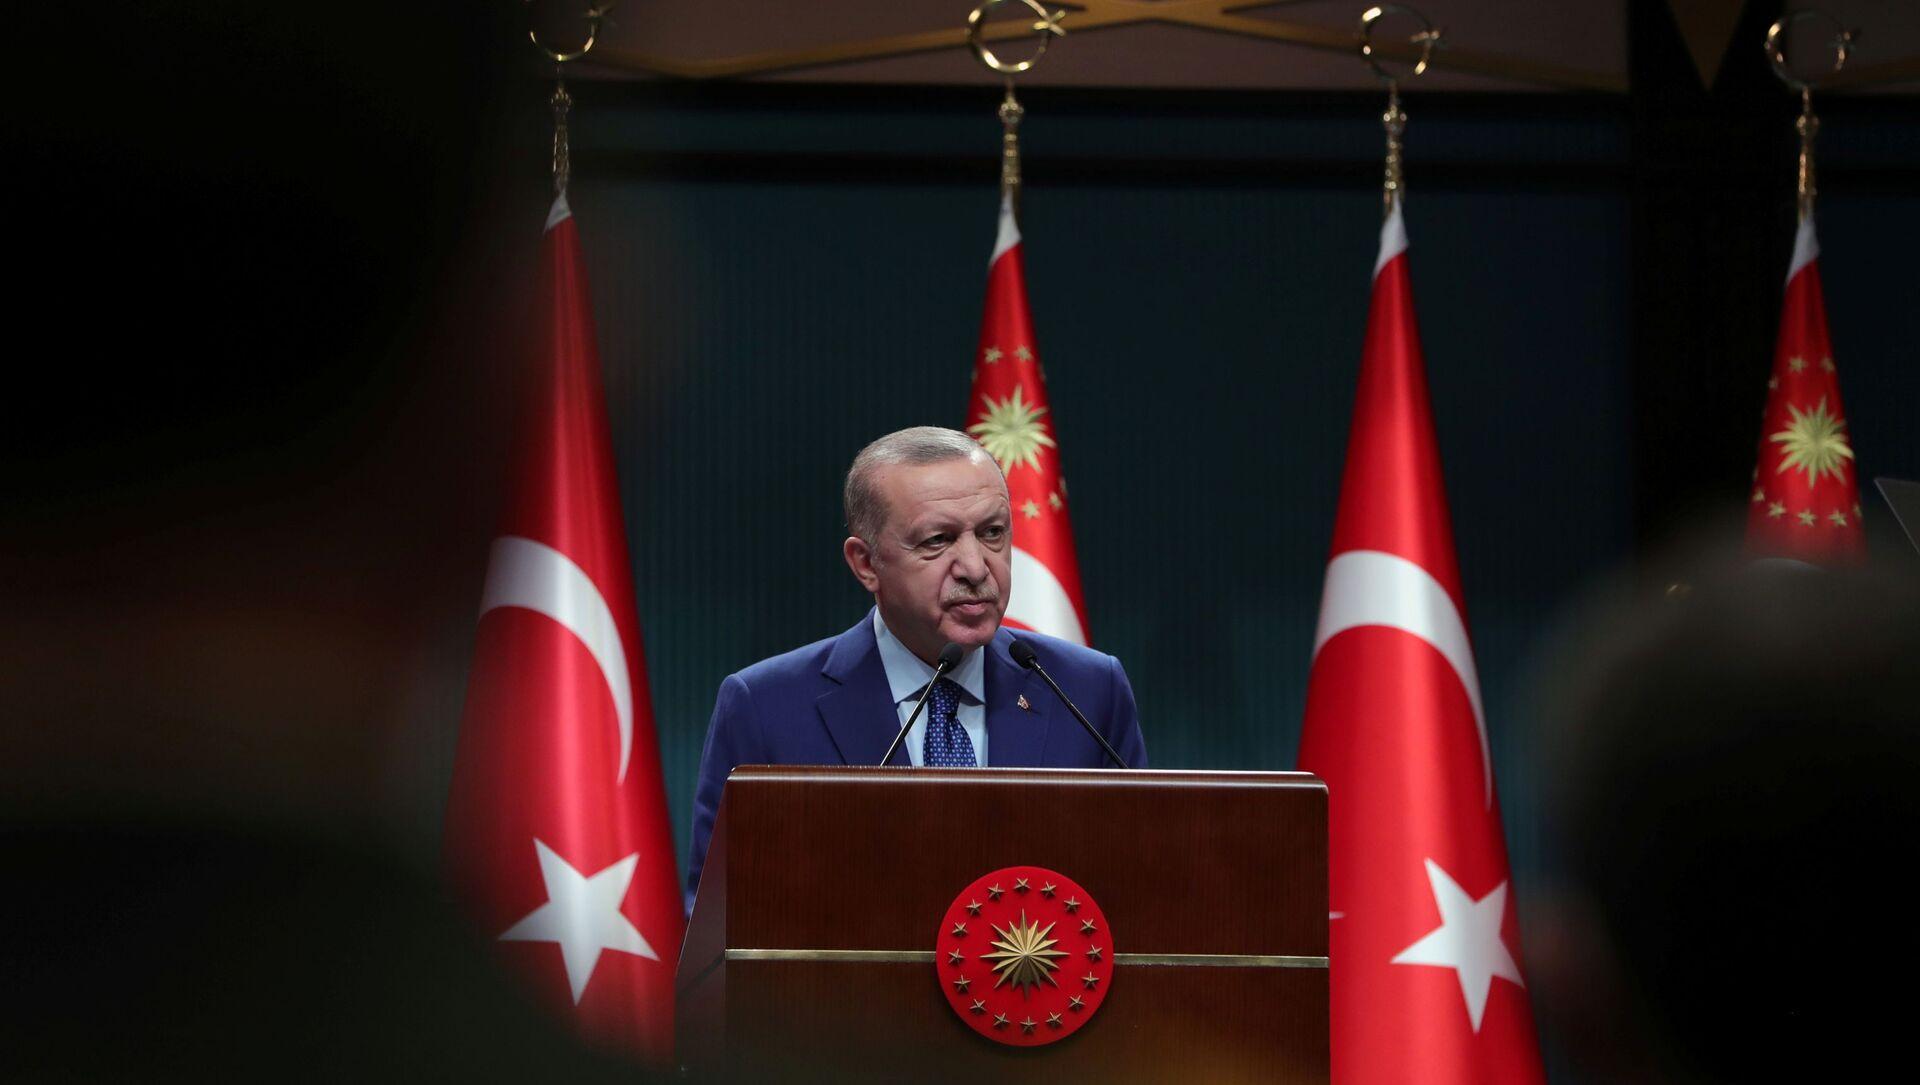 Президент Турции Реджеп Тайип Эрдоган, фото из архива - Sputnik Азербайджан, 1920, 23.09.2021